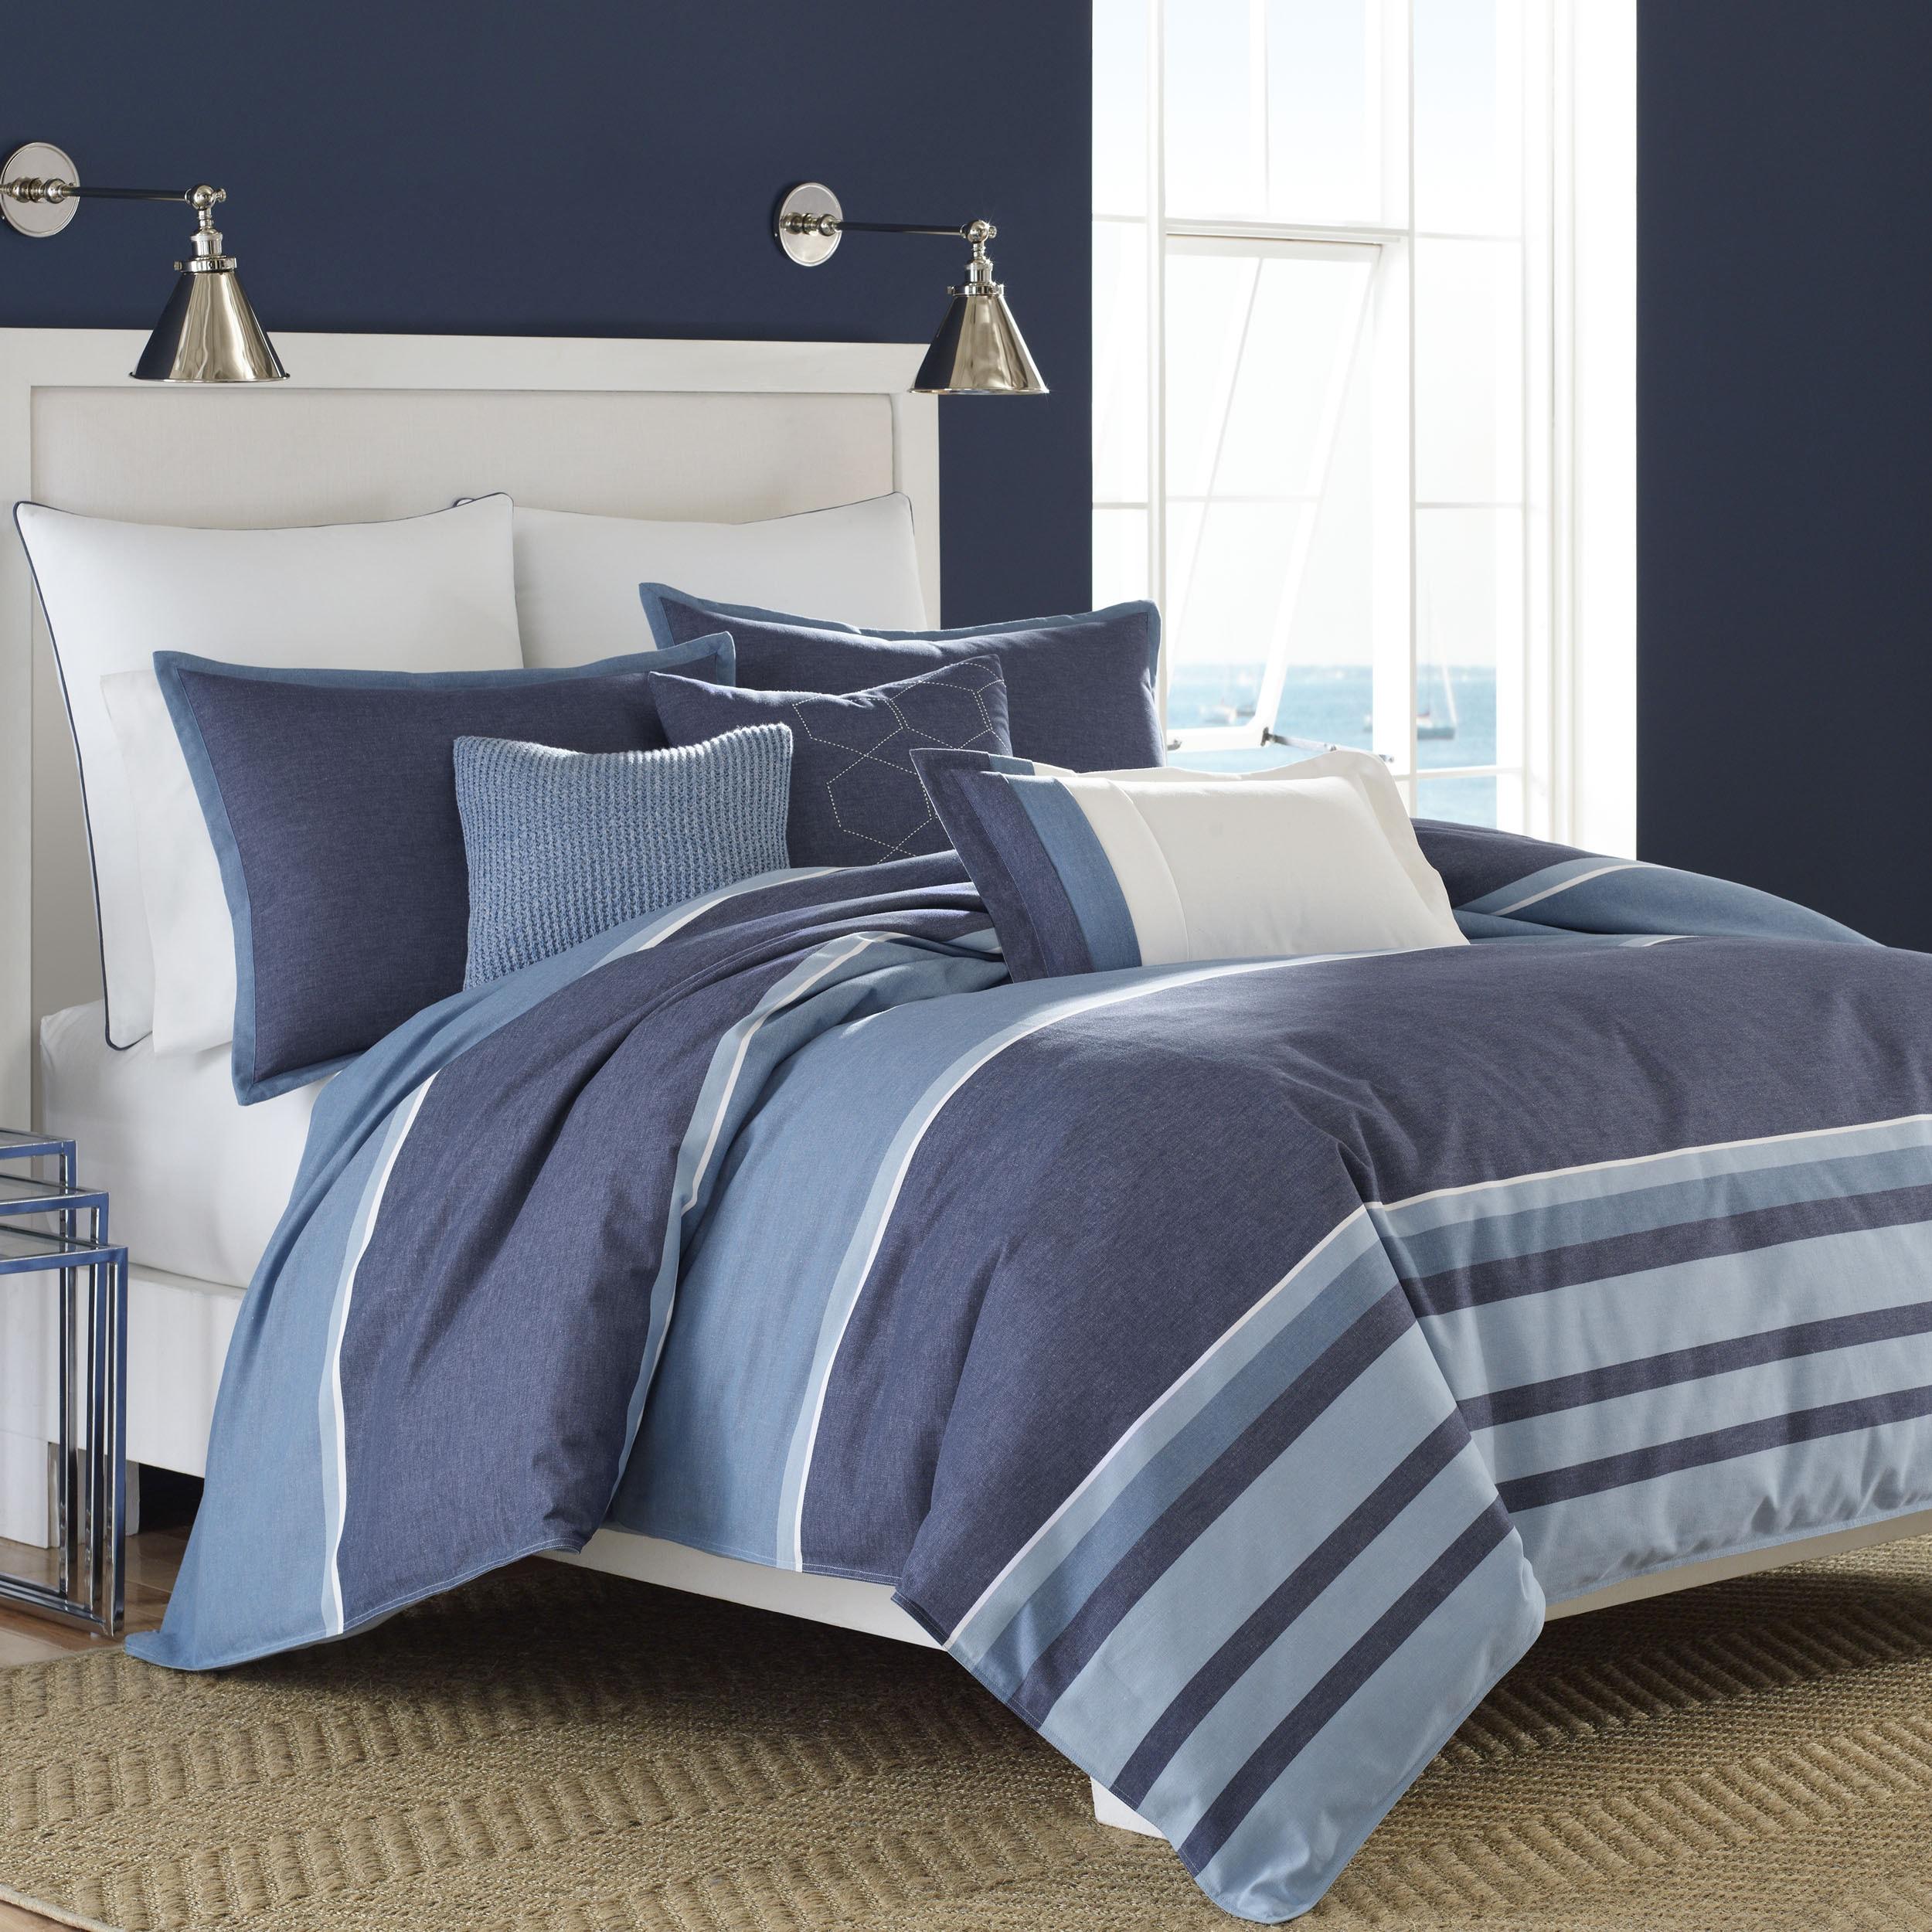 Nautica Broadwater Cotton Comforter Set - Free Shipping Today -  Overstock.com - 18801037